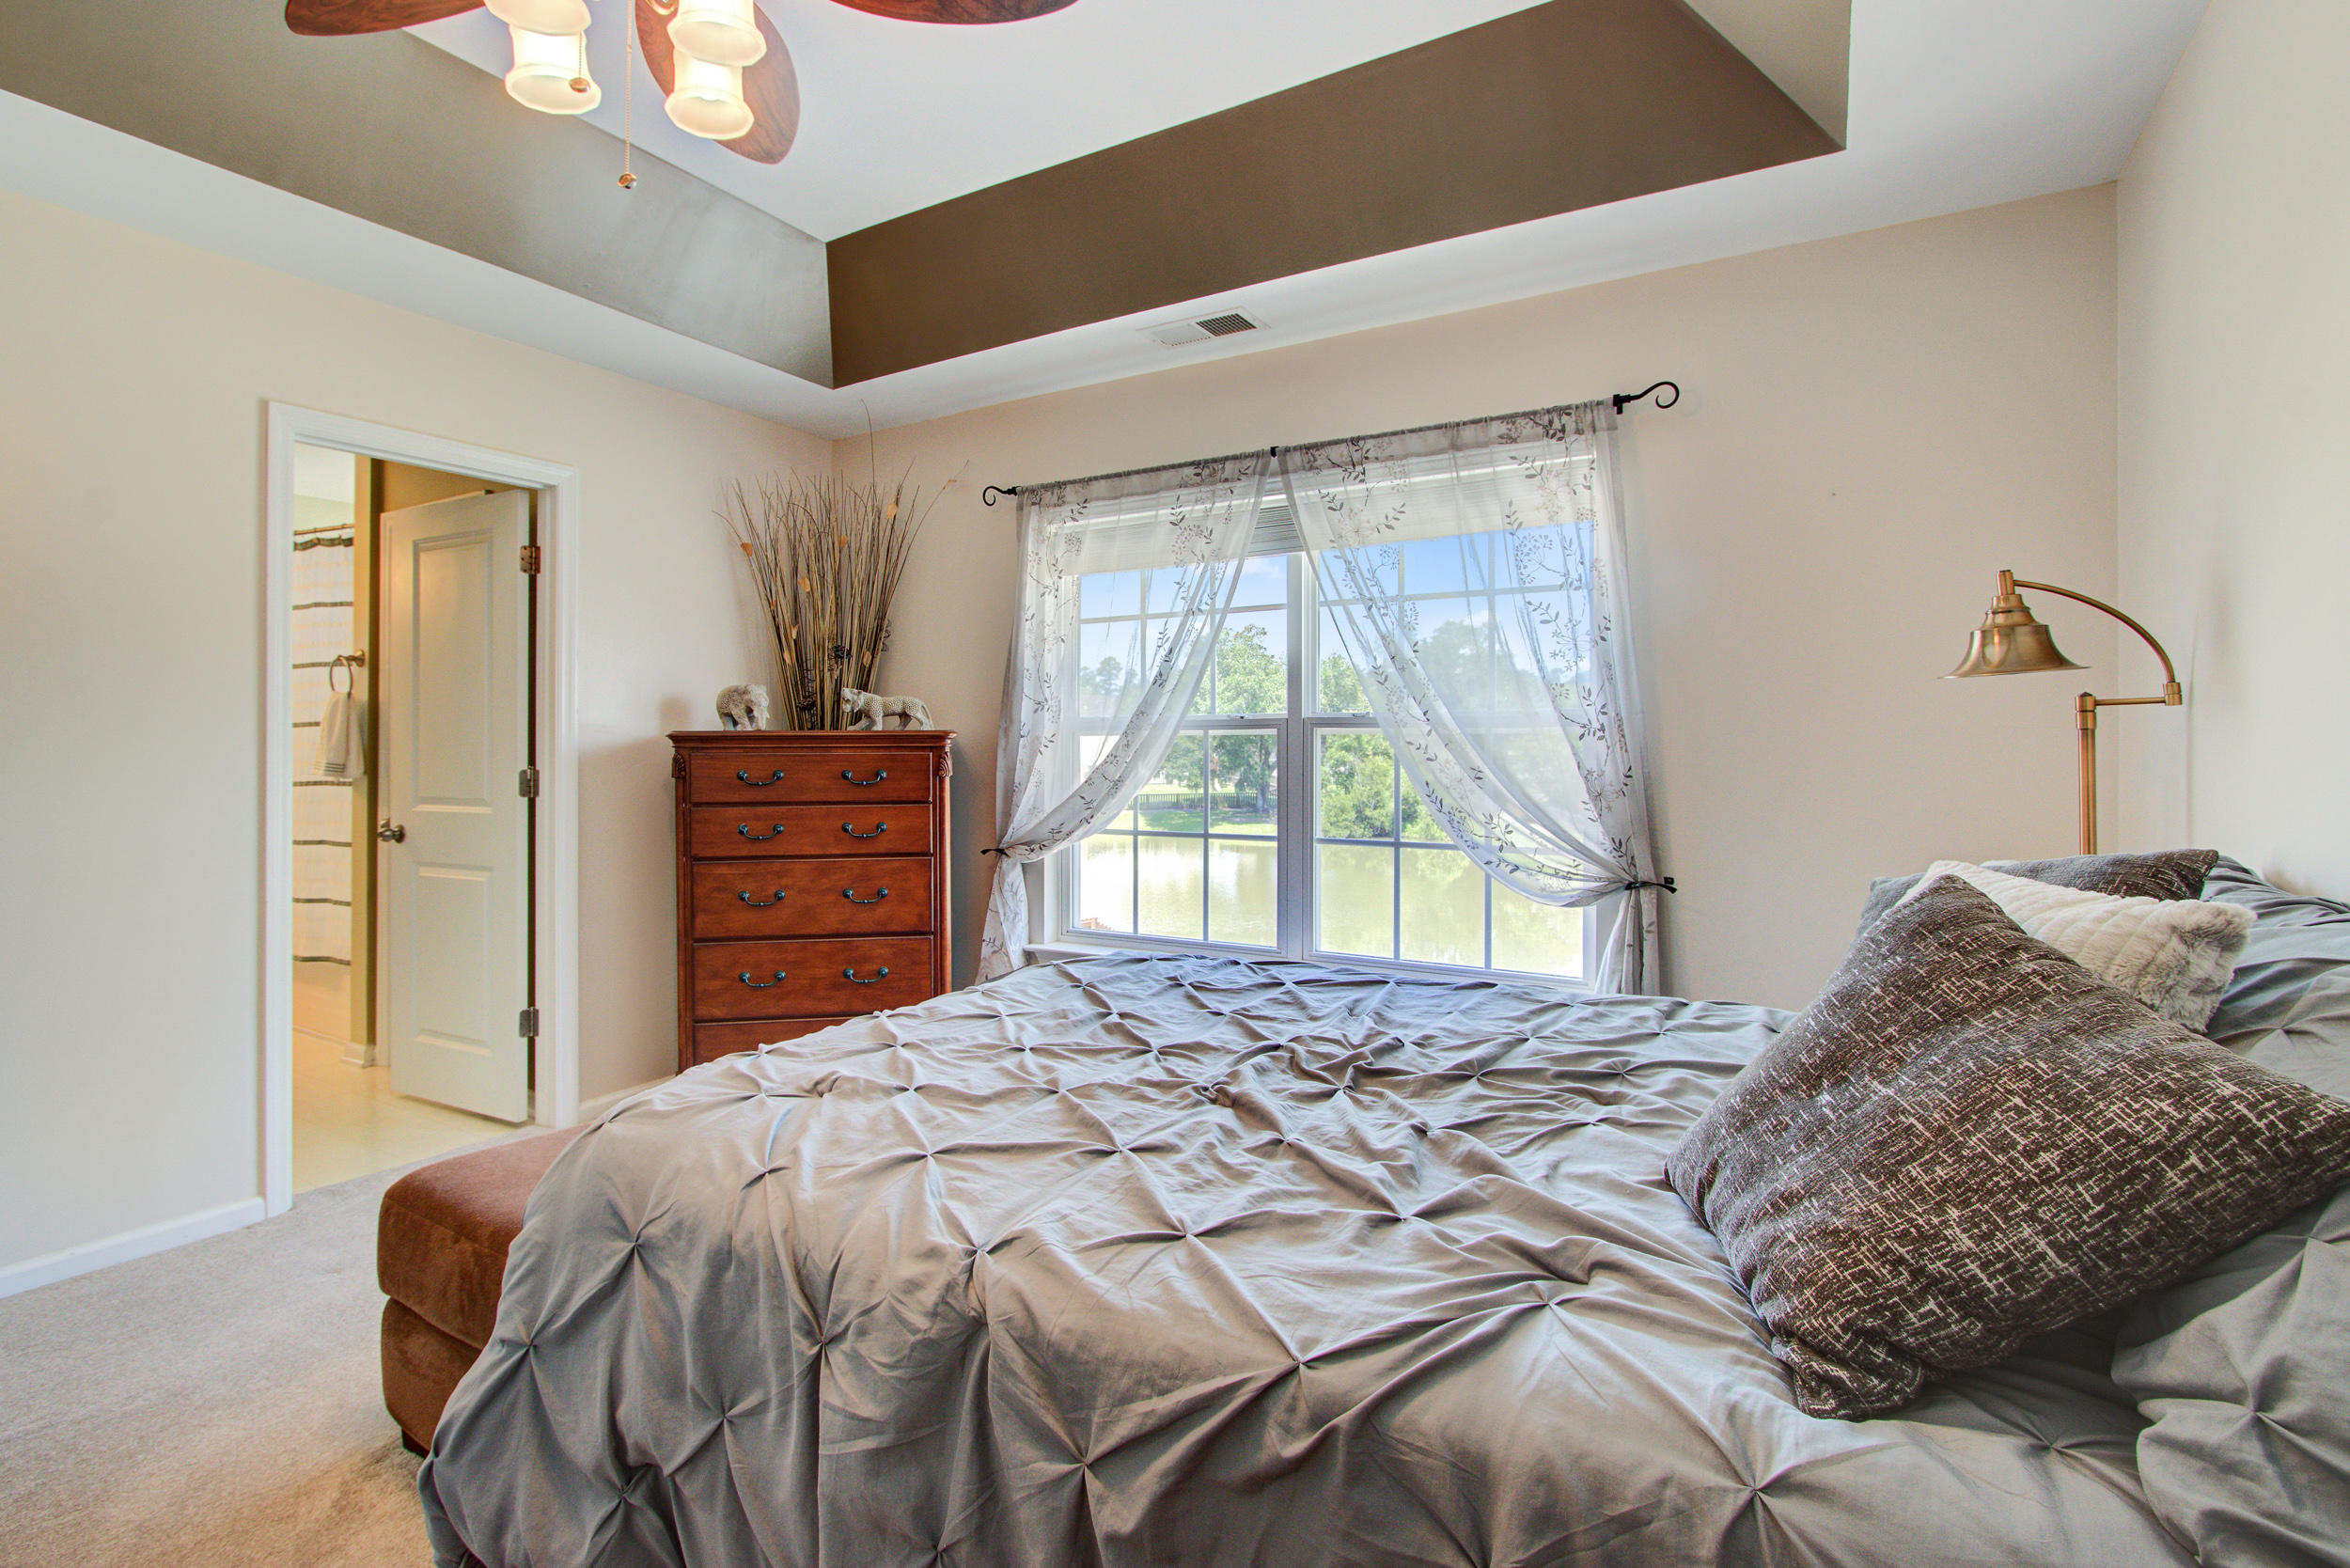 Oakley Pointe Homes For Sale - 576 English Oak, Moncks Corner, SC - 45